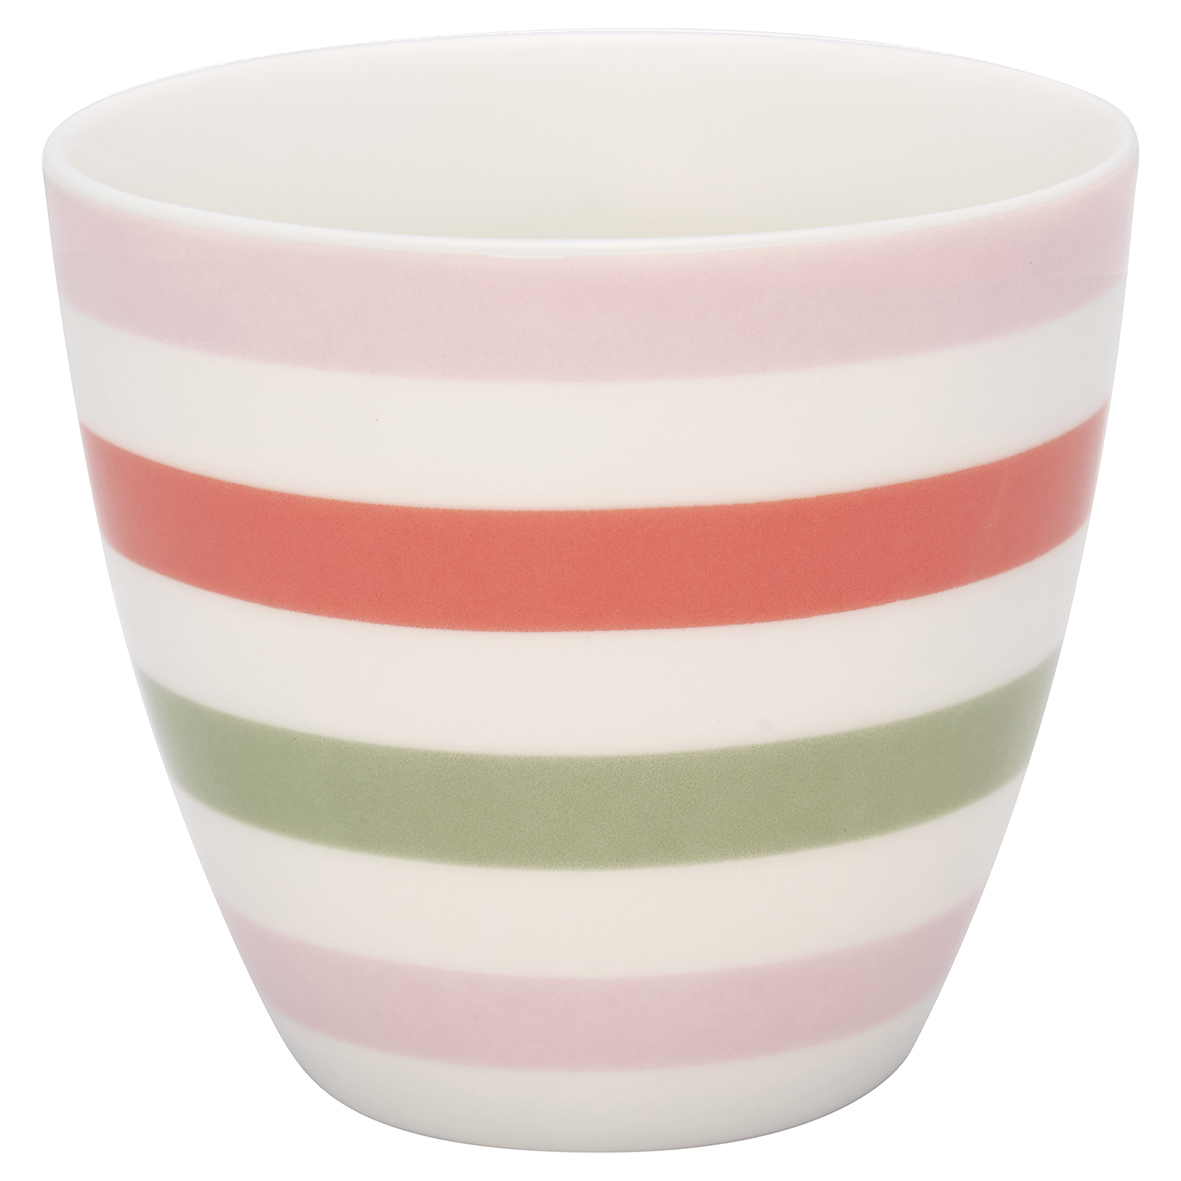 Latte Cup - Valentina white - Greengate